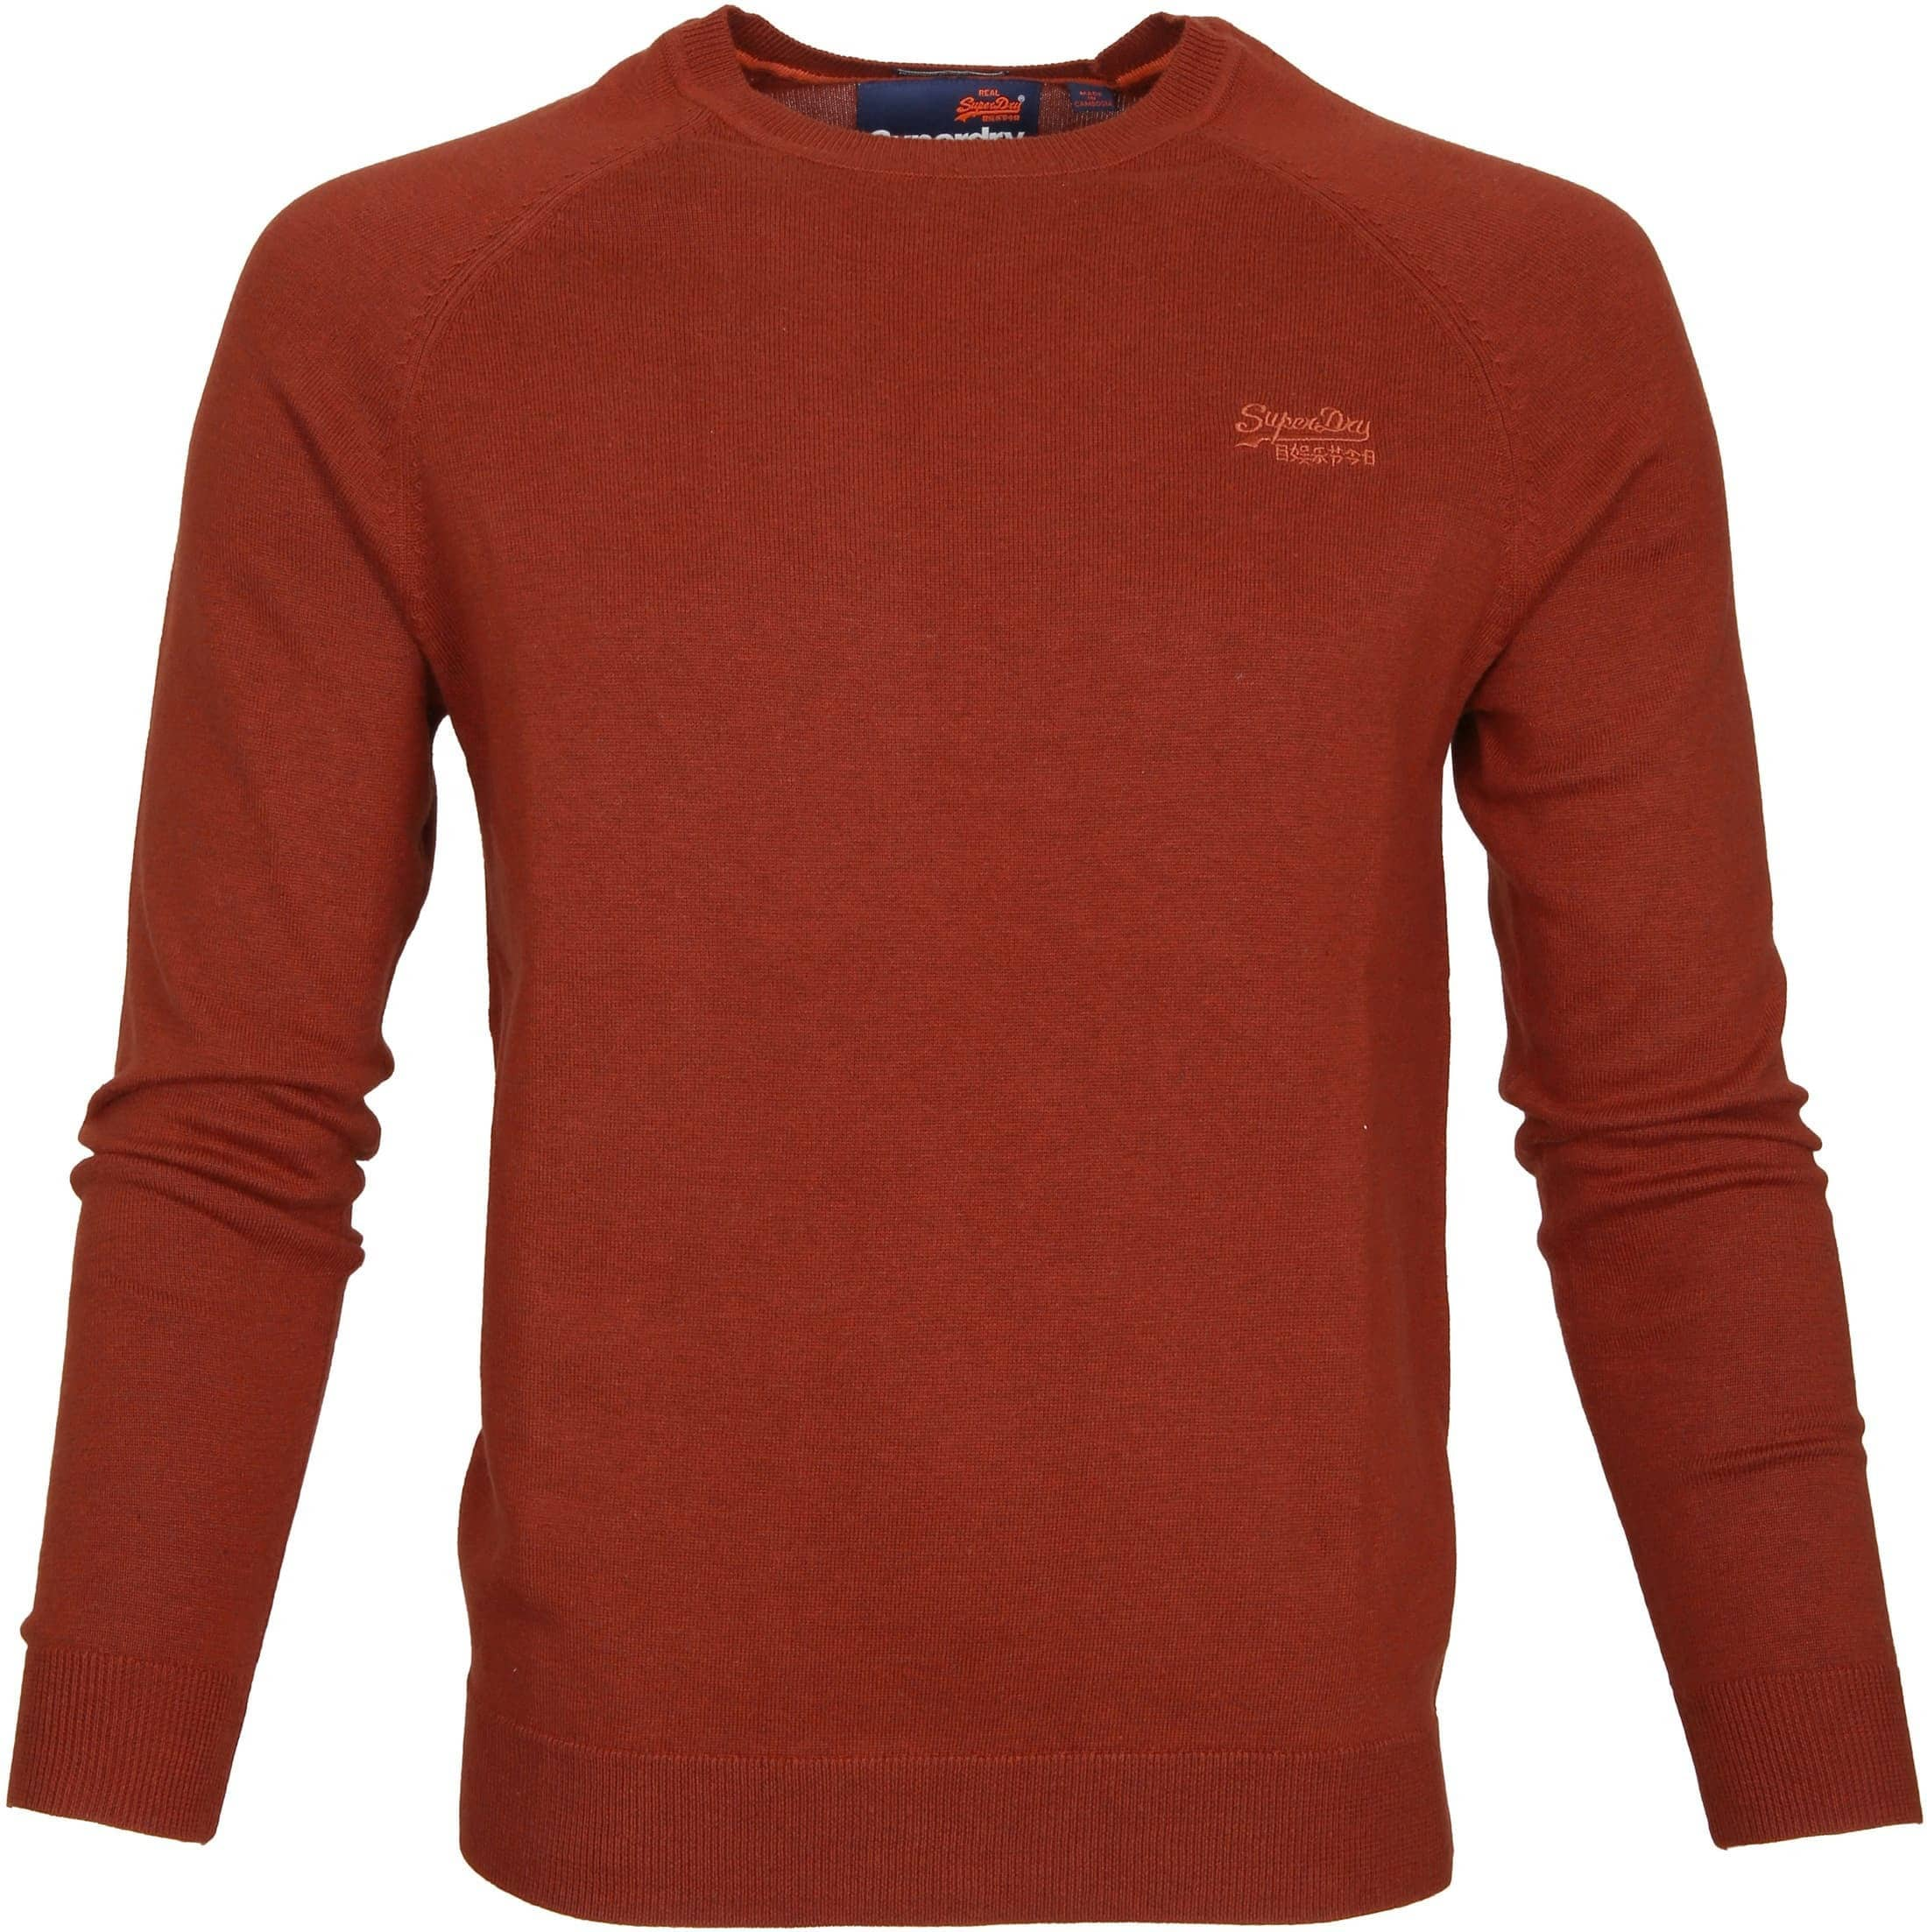 Superdry Sweater Melange Rood Oranje foto 0